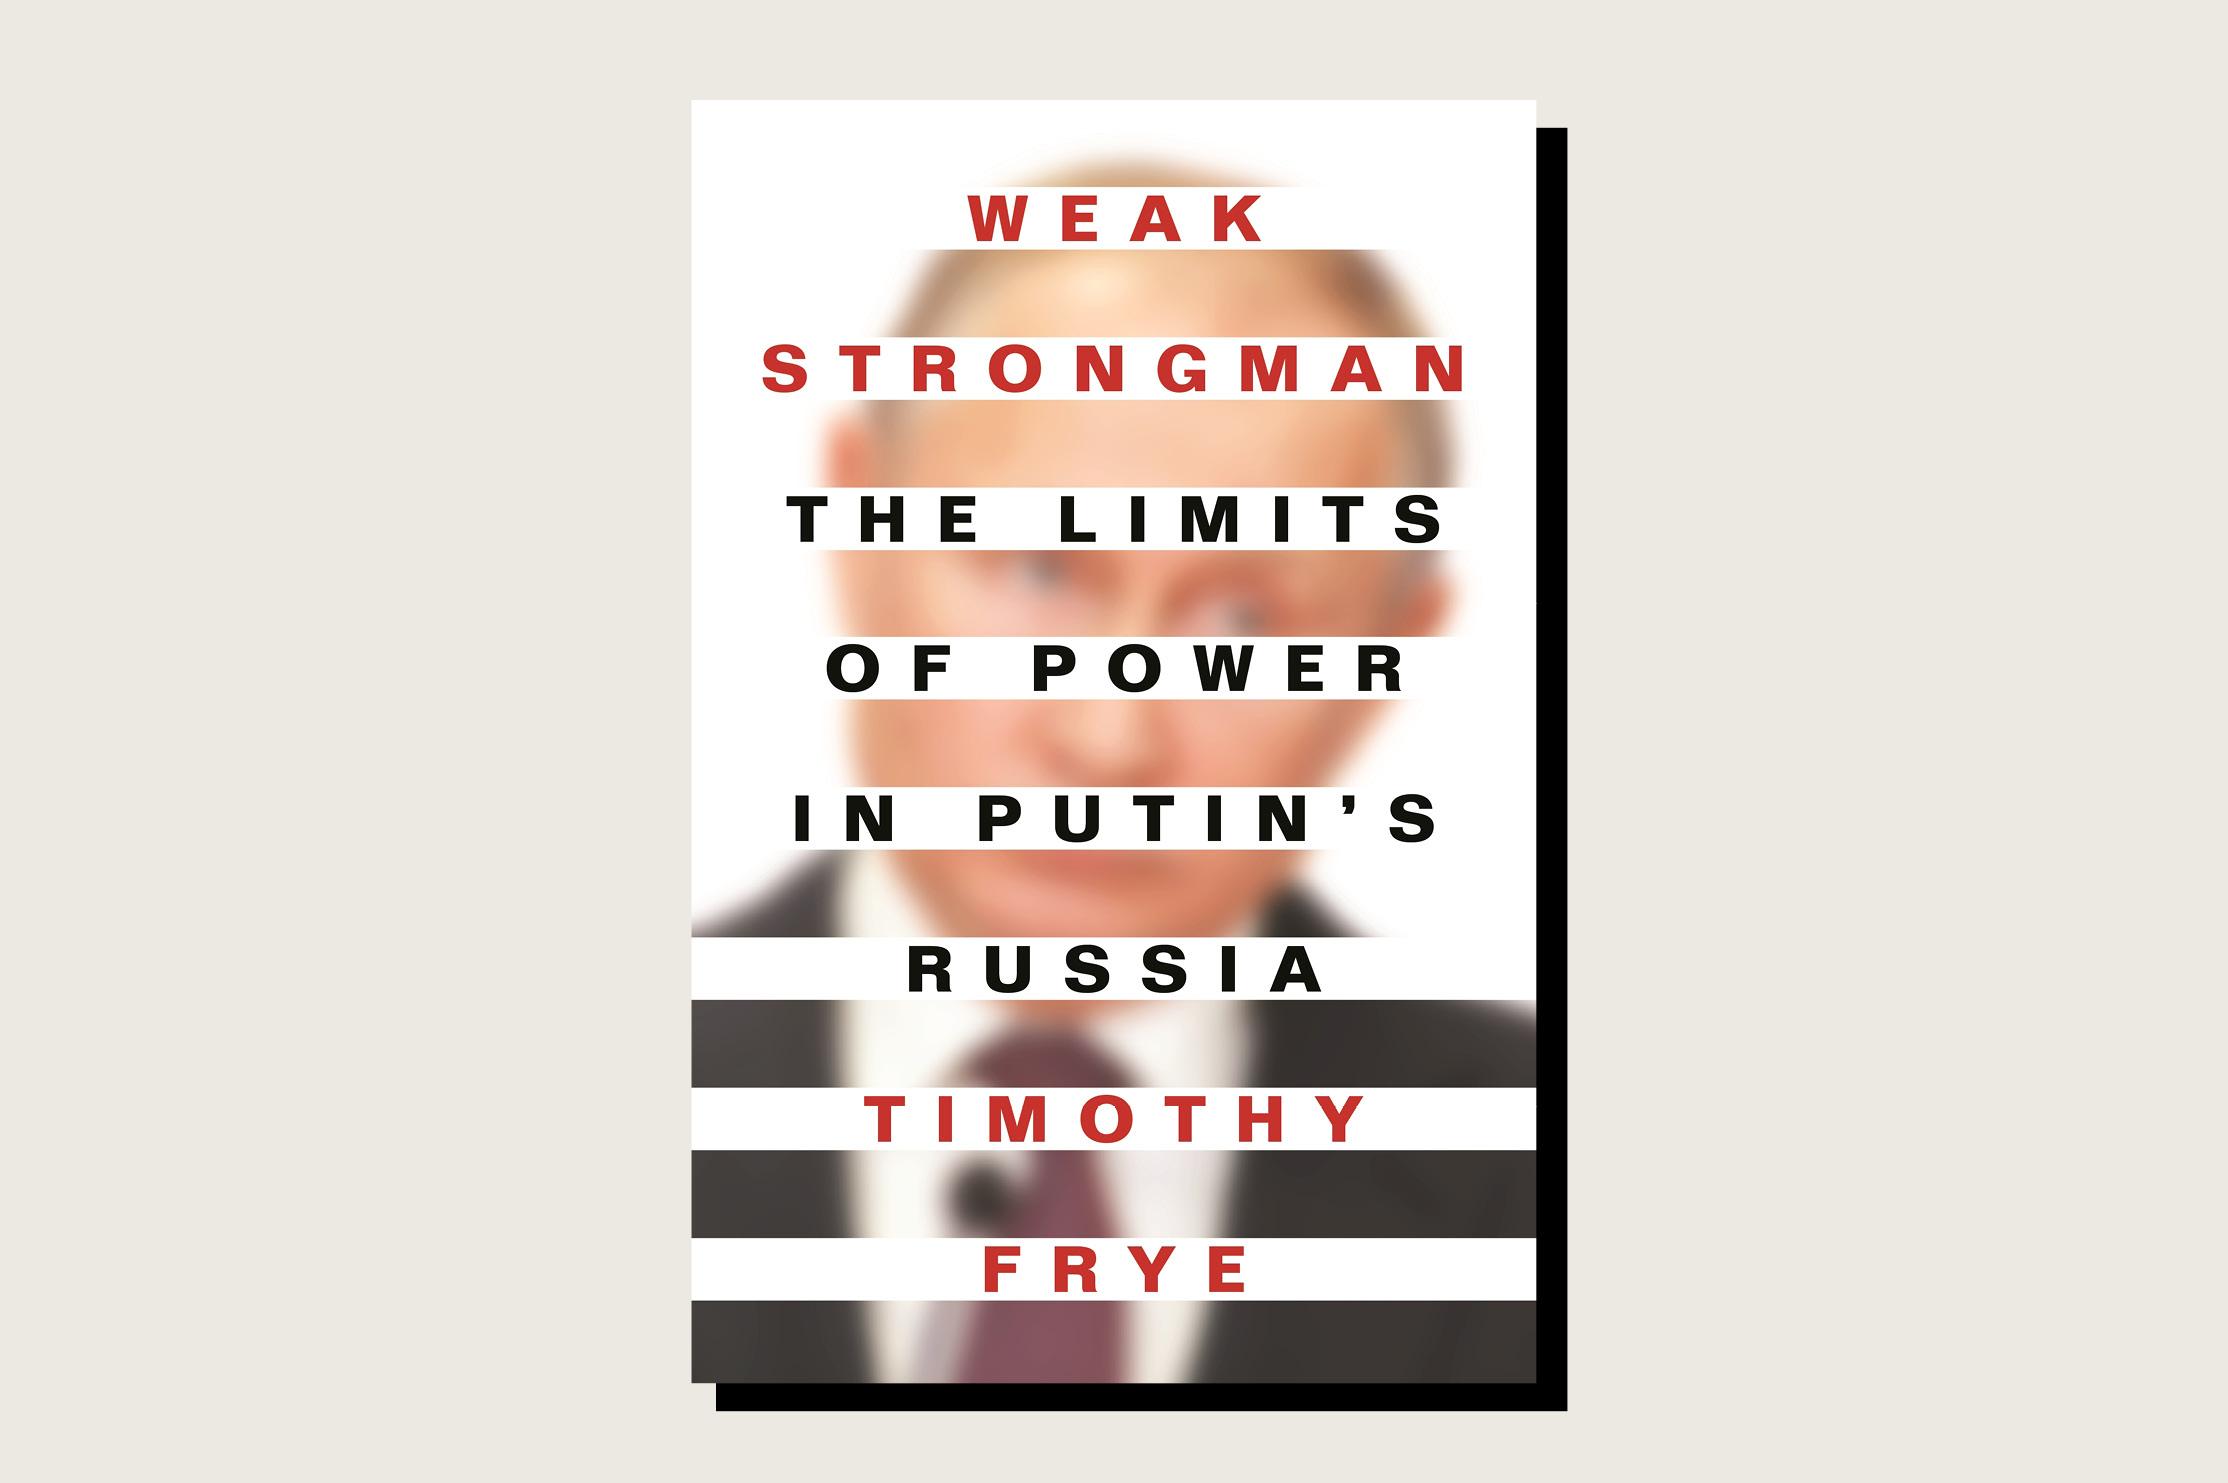 Weak Strongman: The Limits of Power in Putin's Russia, Timothy Frye, Princeton University Press, 288 pp., .95, April 2021